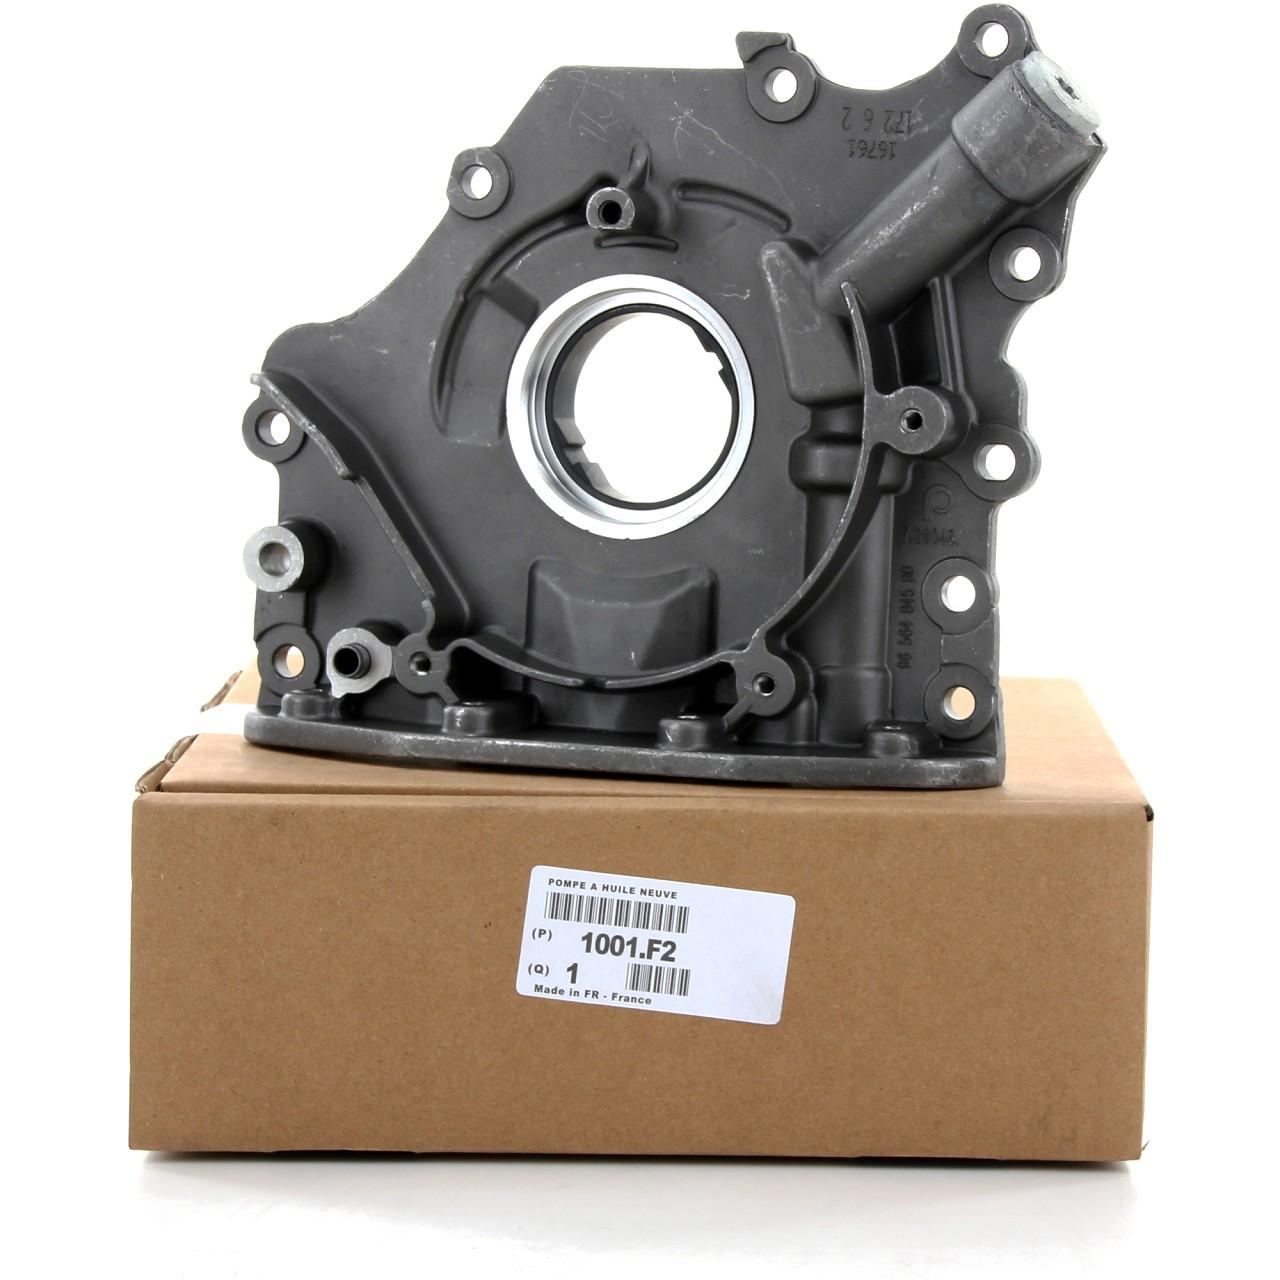 ORIGINAL Peugeot Ölpumpe 1007 107 206 207 3008 307 308 407 5008 508 1001.F2